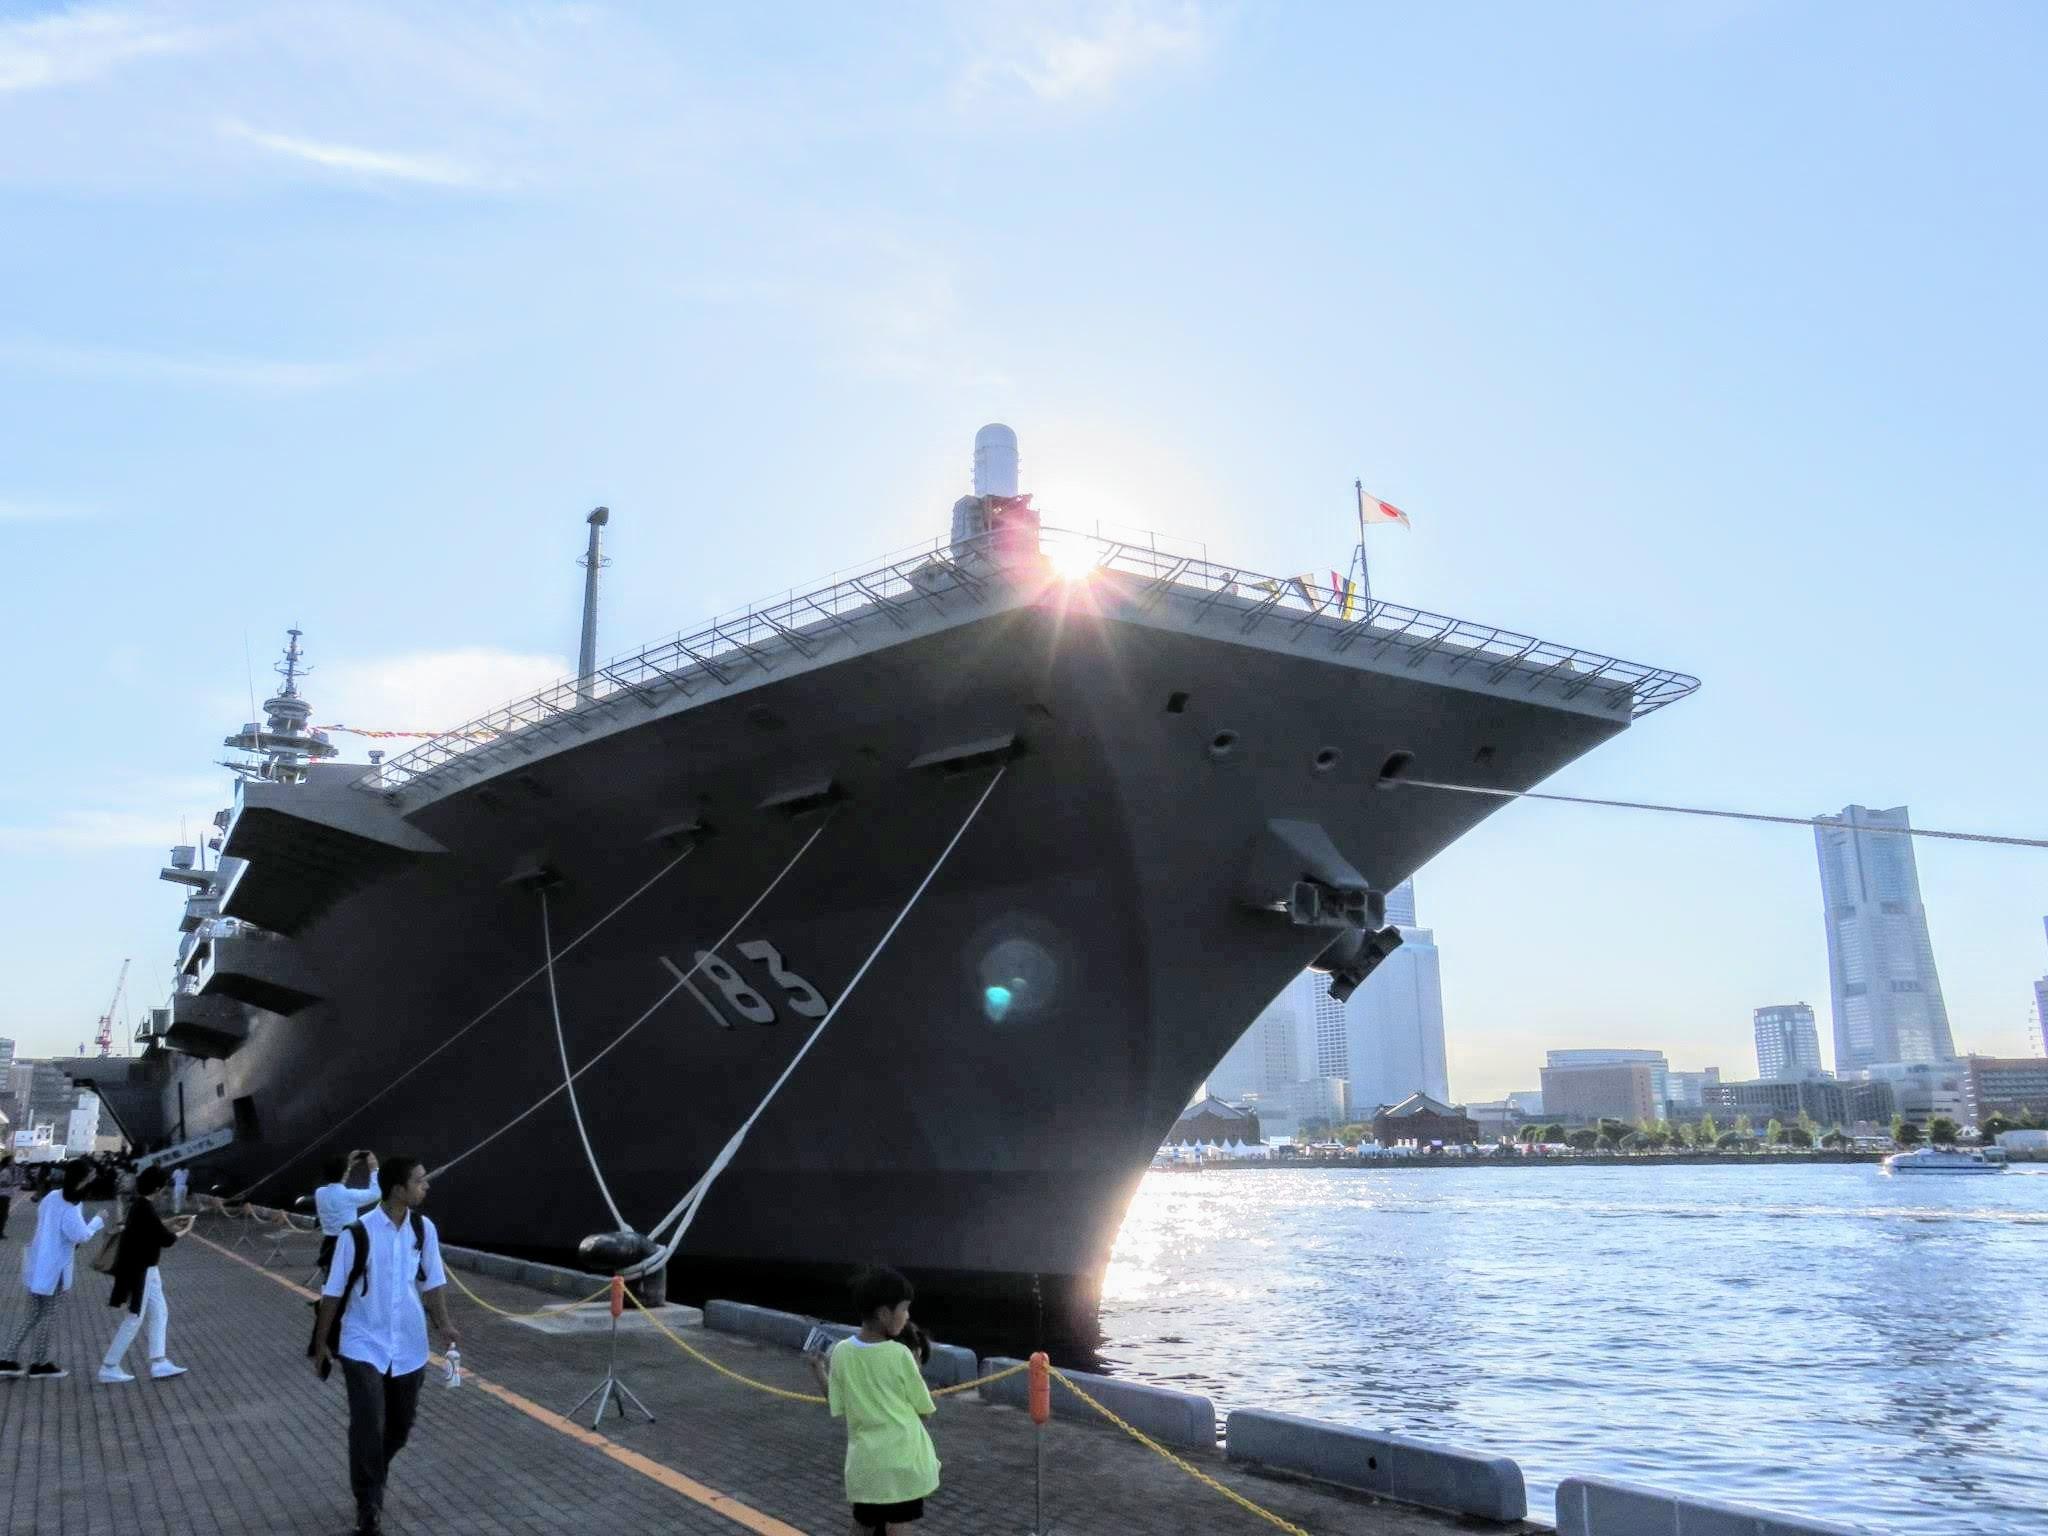 FLEETWEEK2019横浜 - 護衛艦「いずも」一般公開_a0057402_21291012.jpg